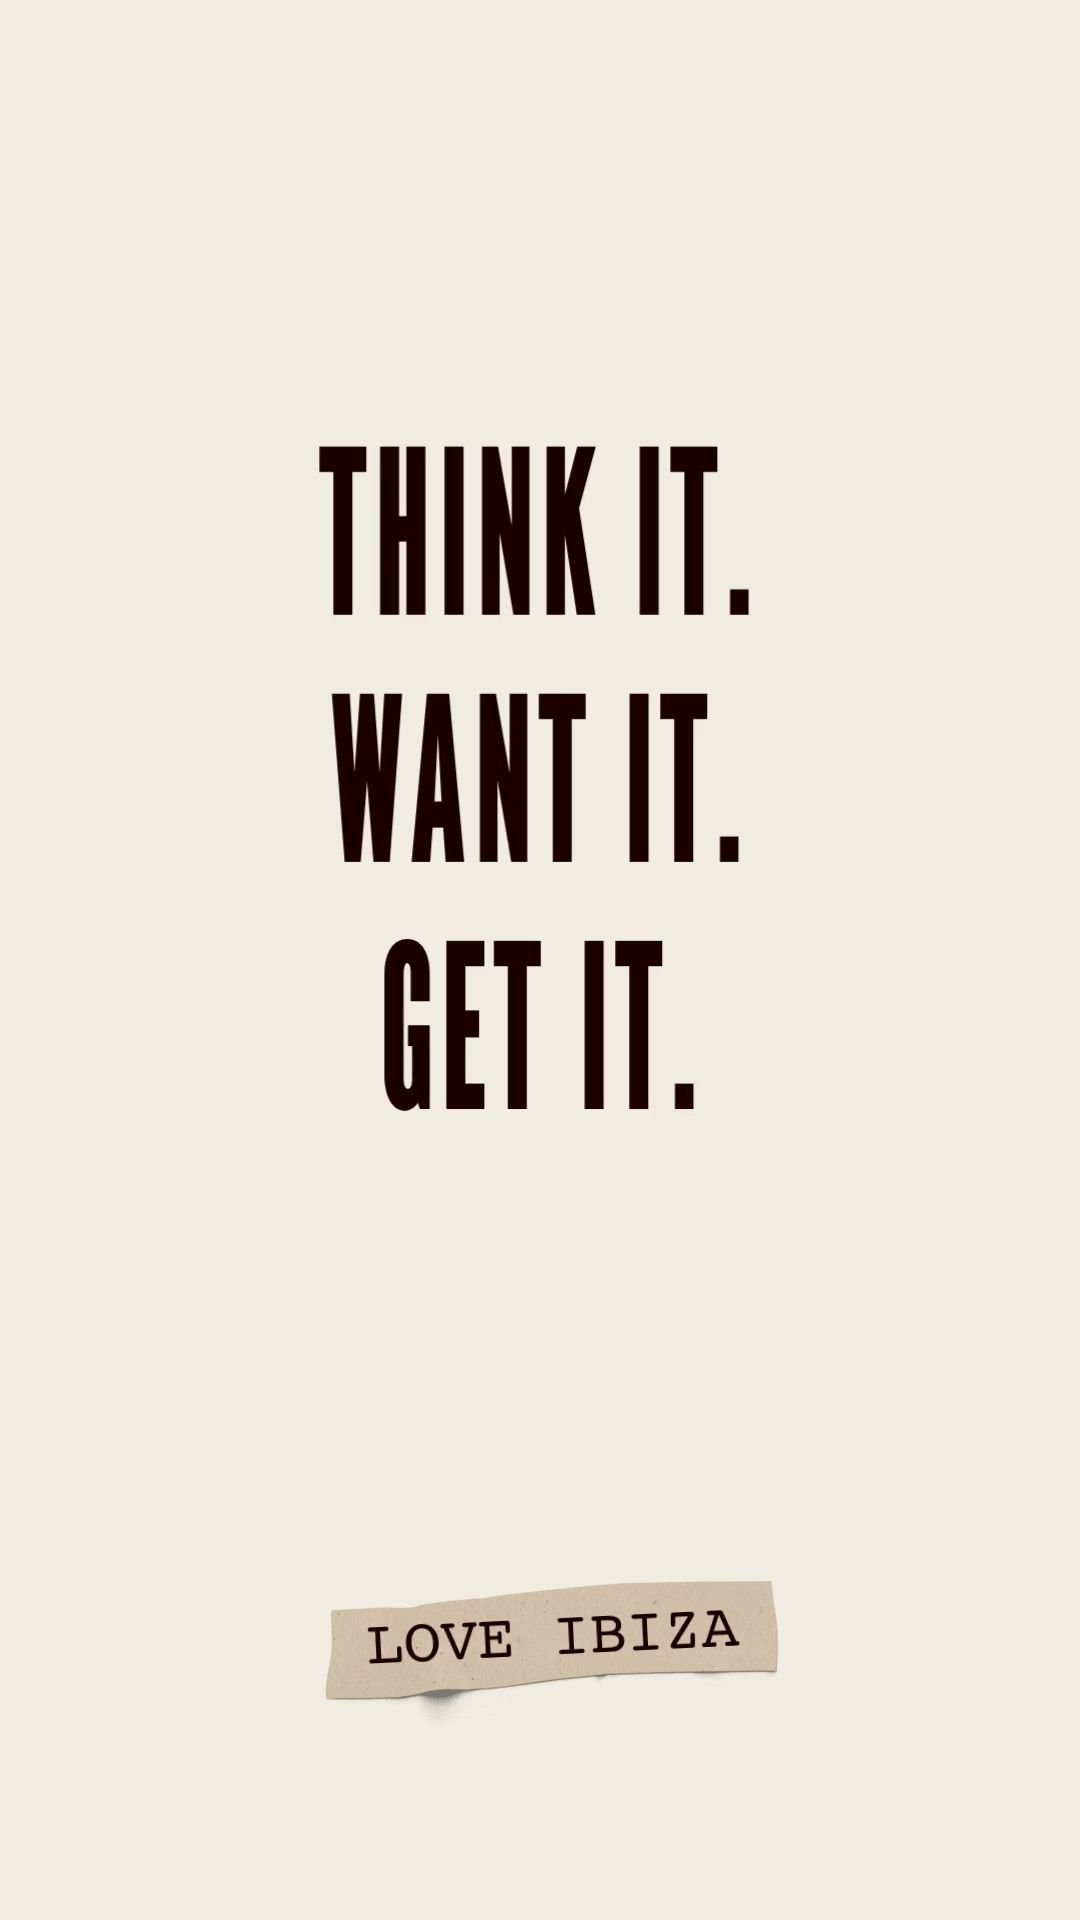 Think it. Want it. Get it.